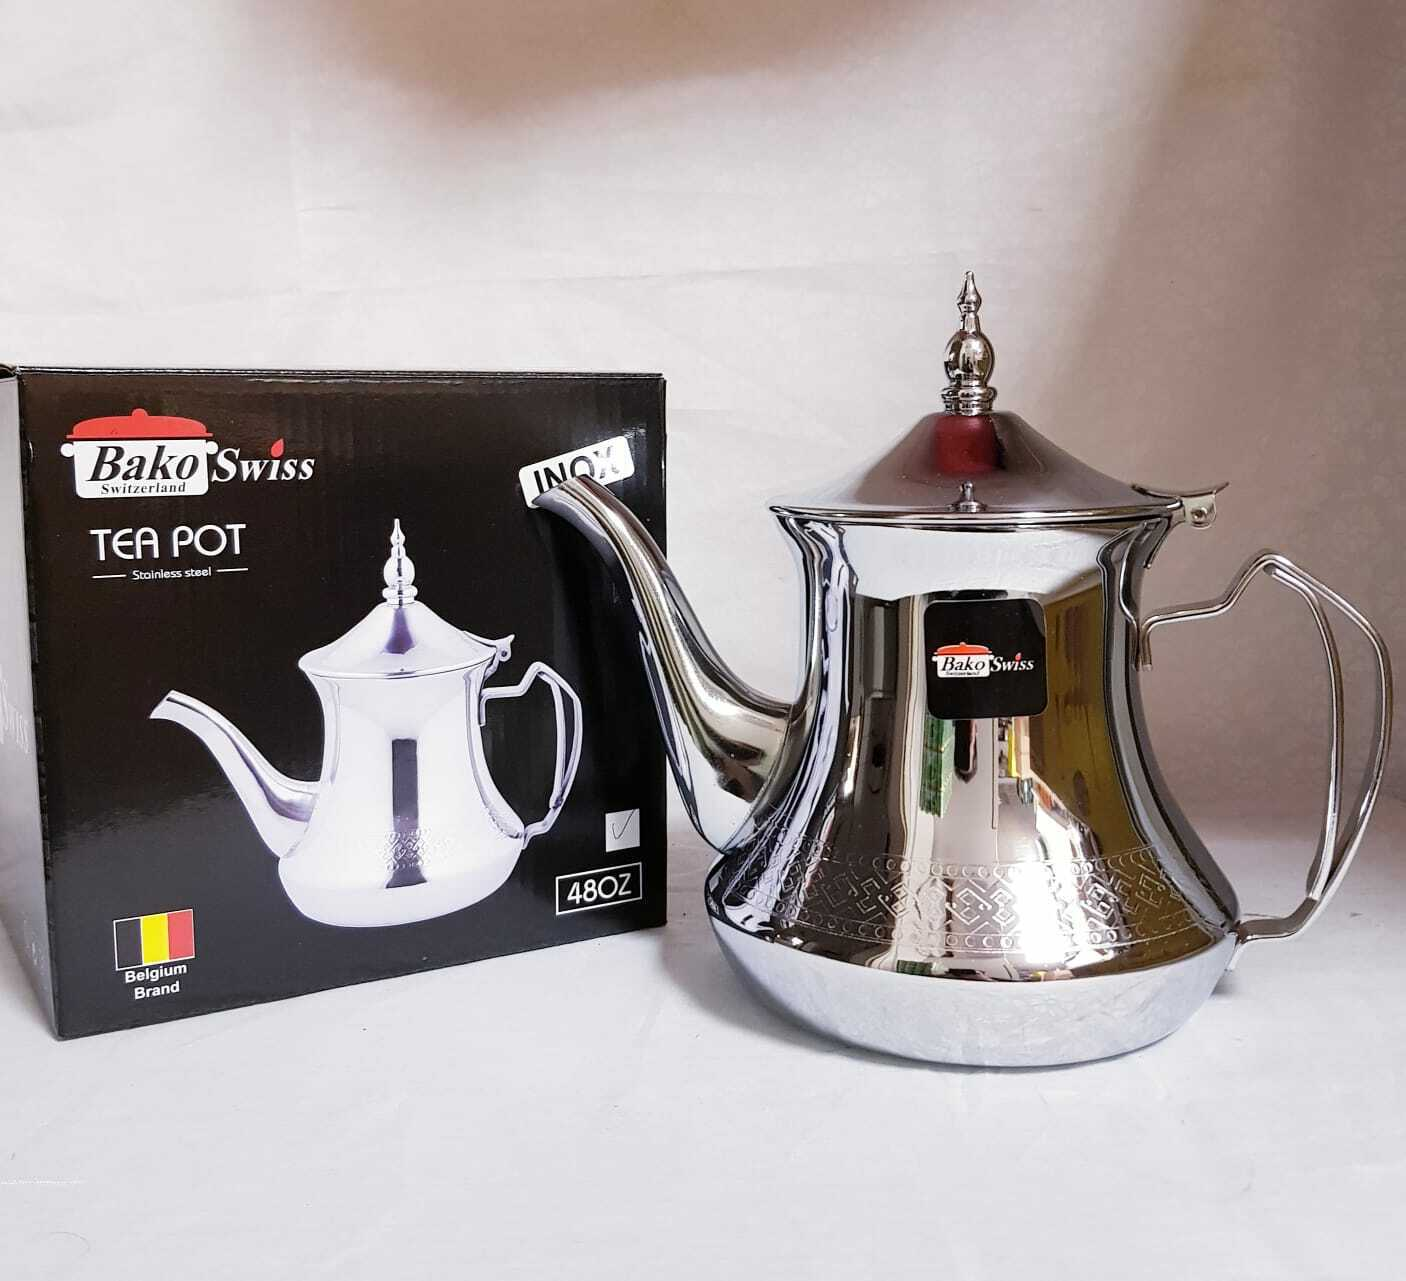 Orient Teekanne Marokkanische Kanne 1,2 L Marrakesch Style  Minztee  Minze Tee